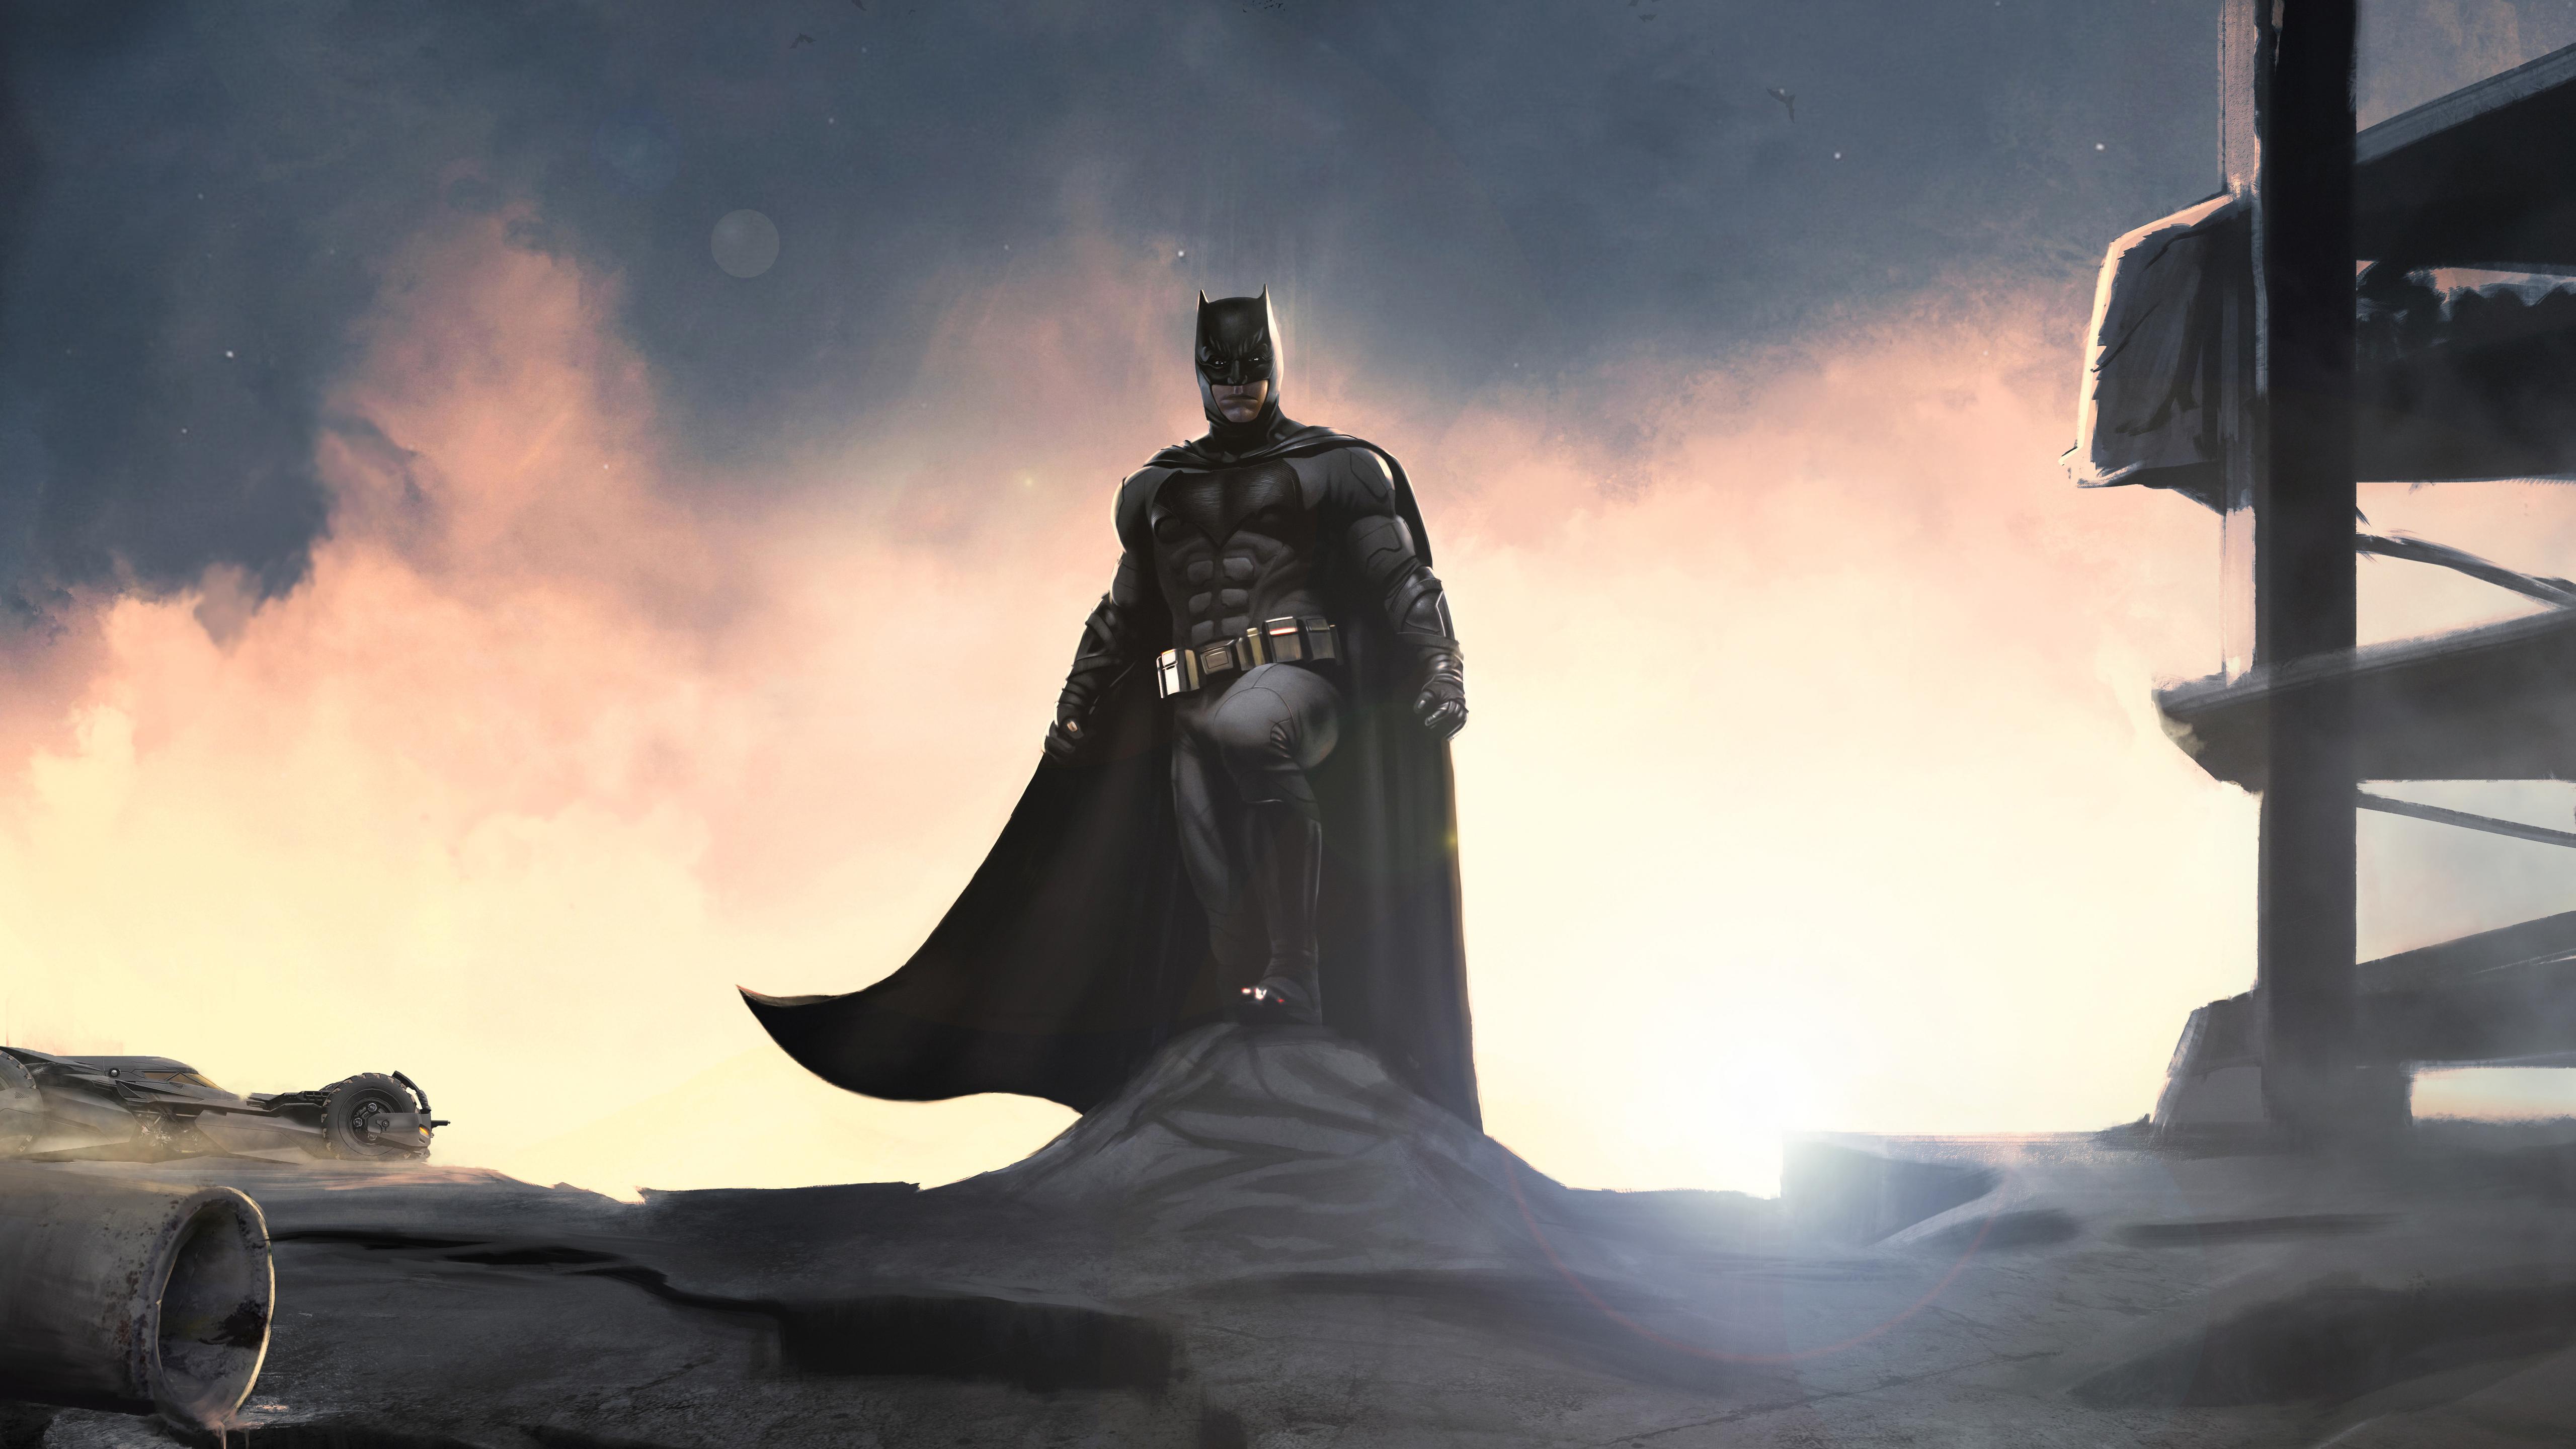 batman-5k-2020-artwork-0q.jpg